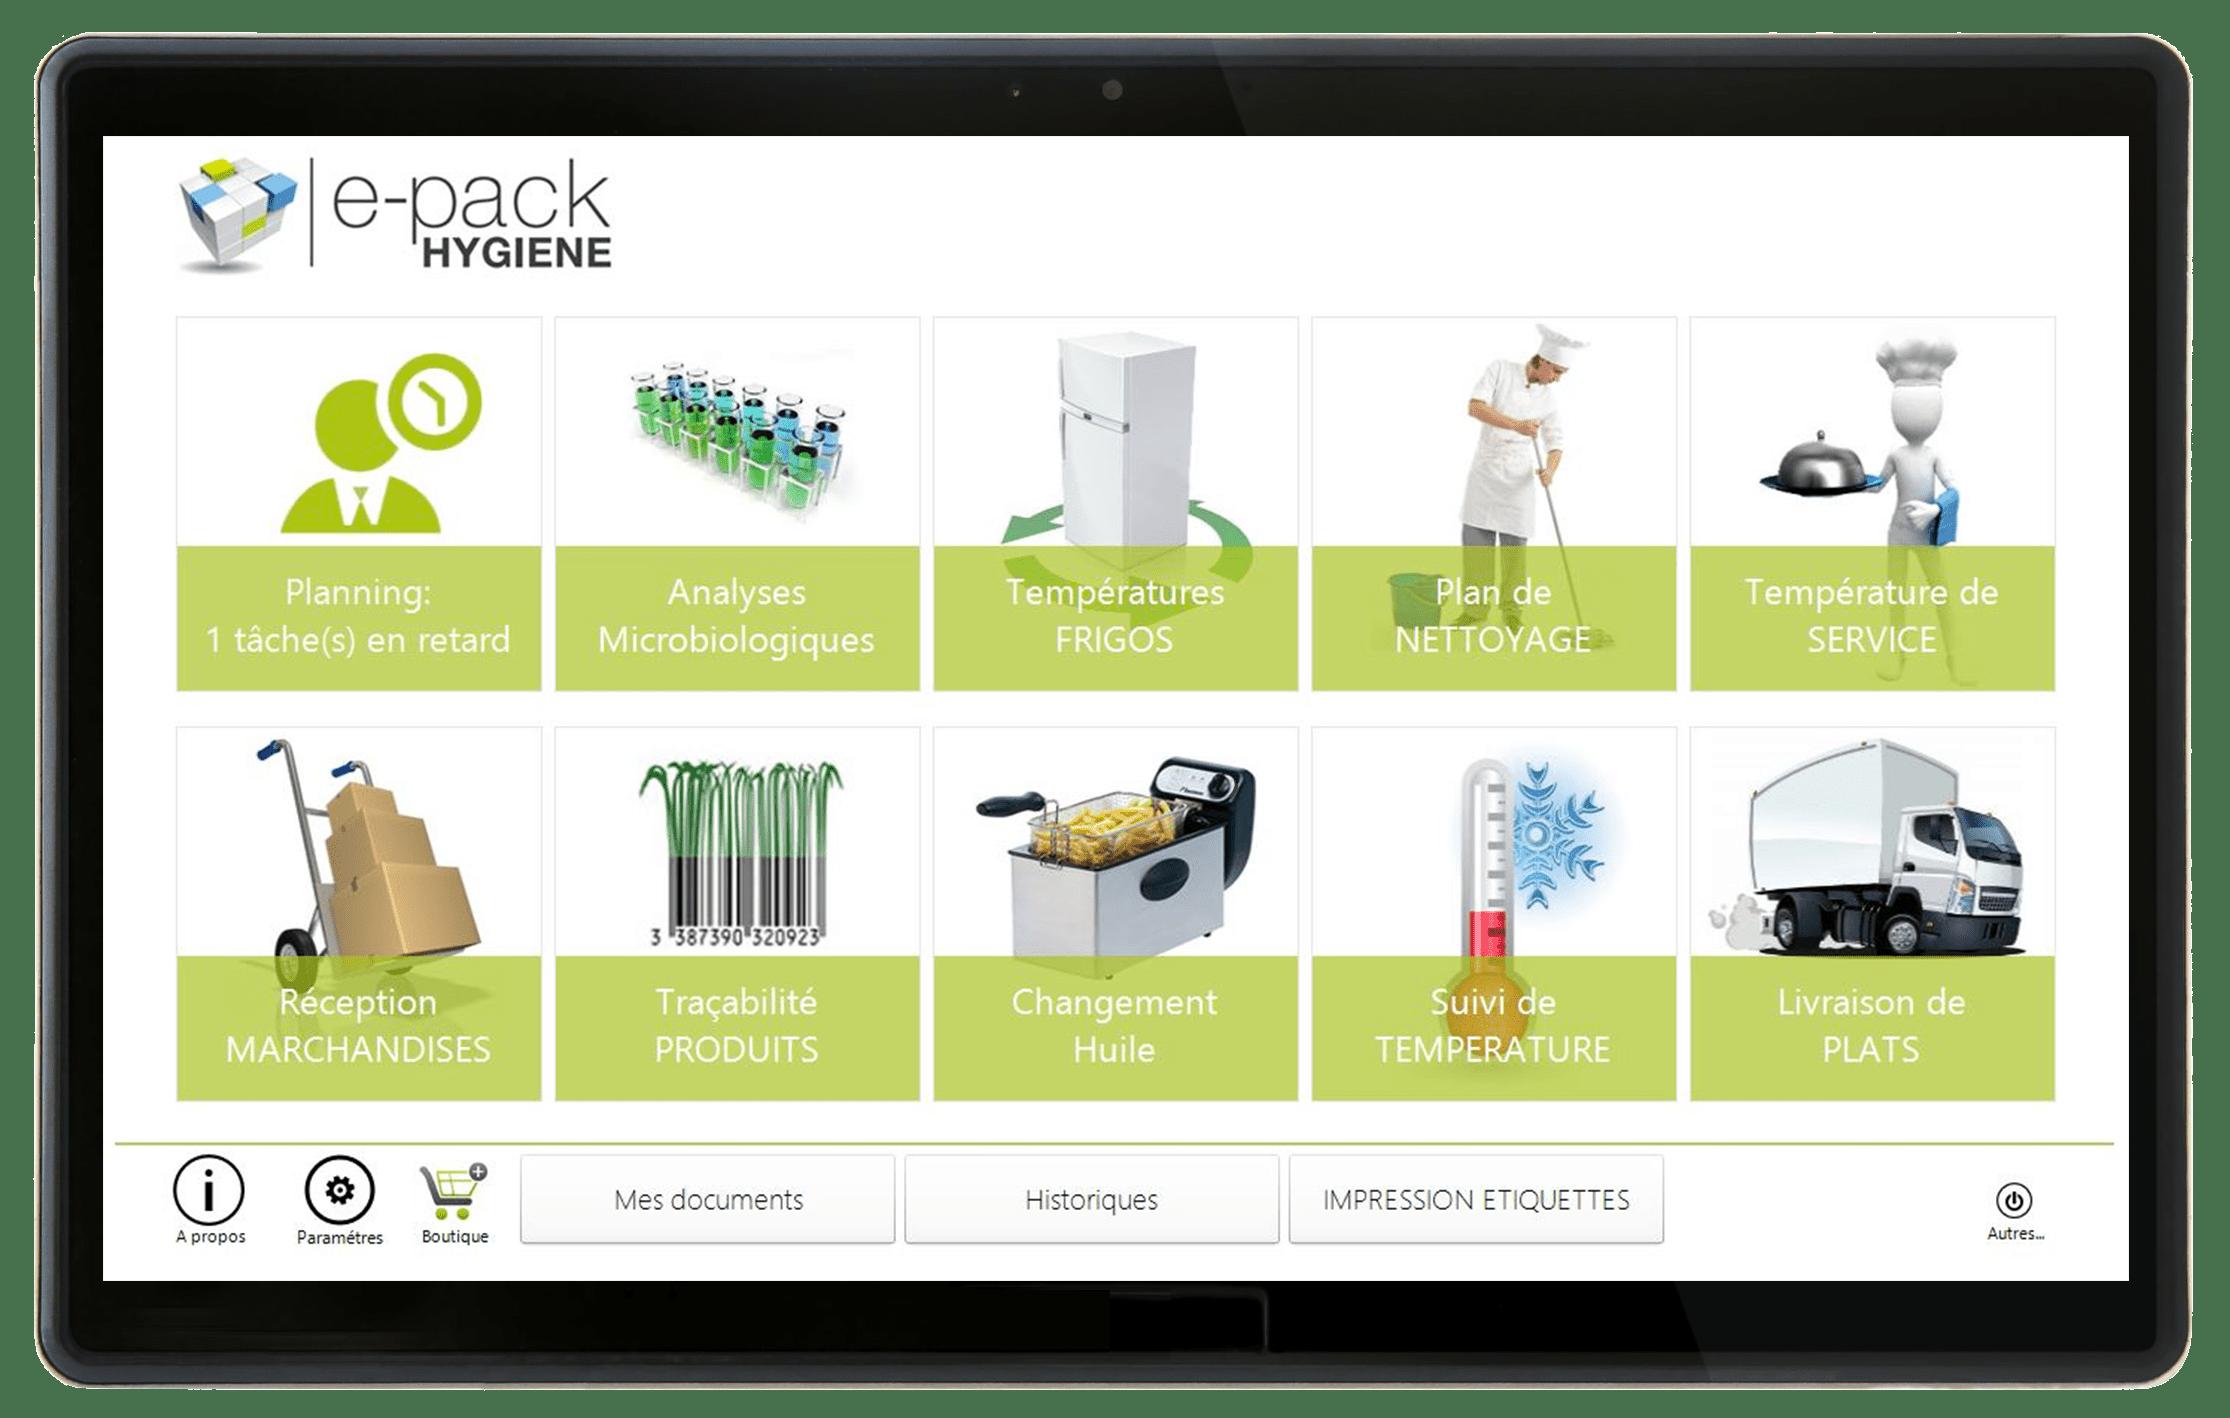 epack-hygiene-interface